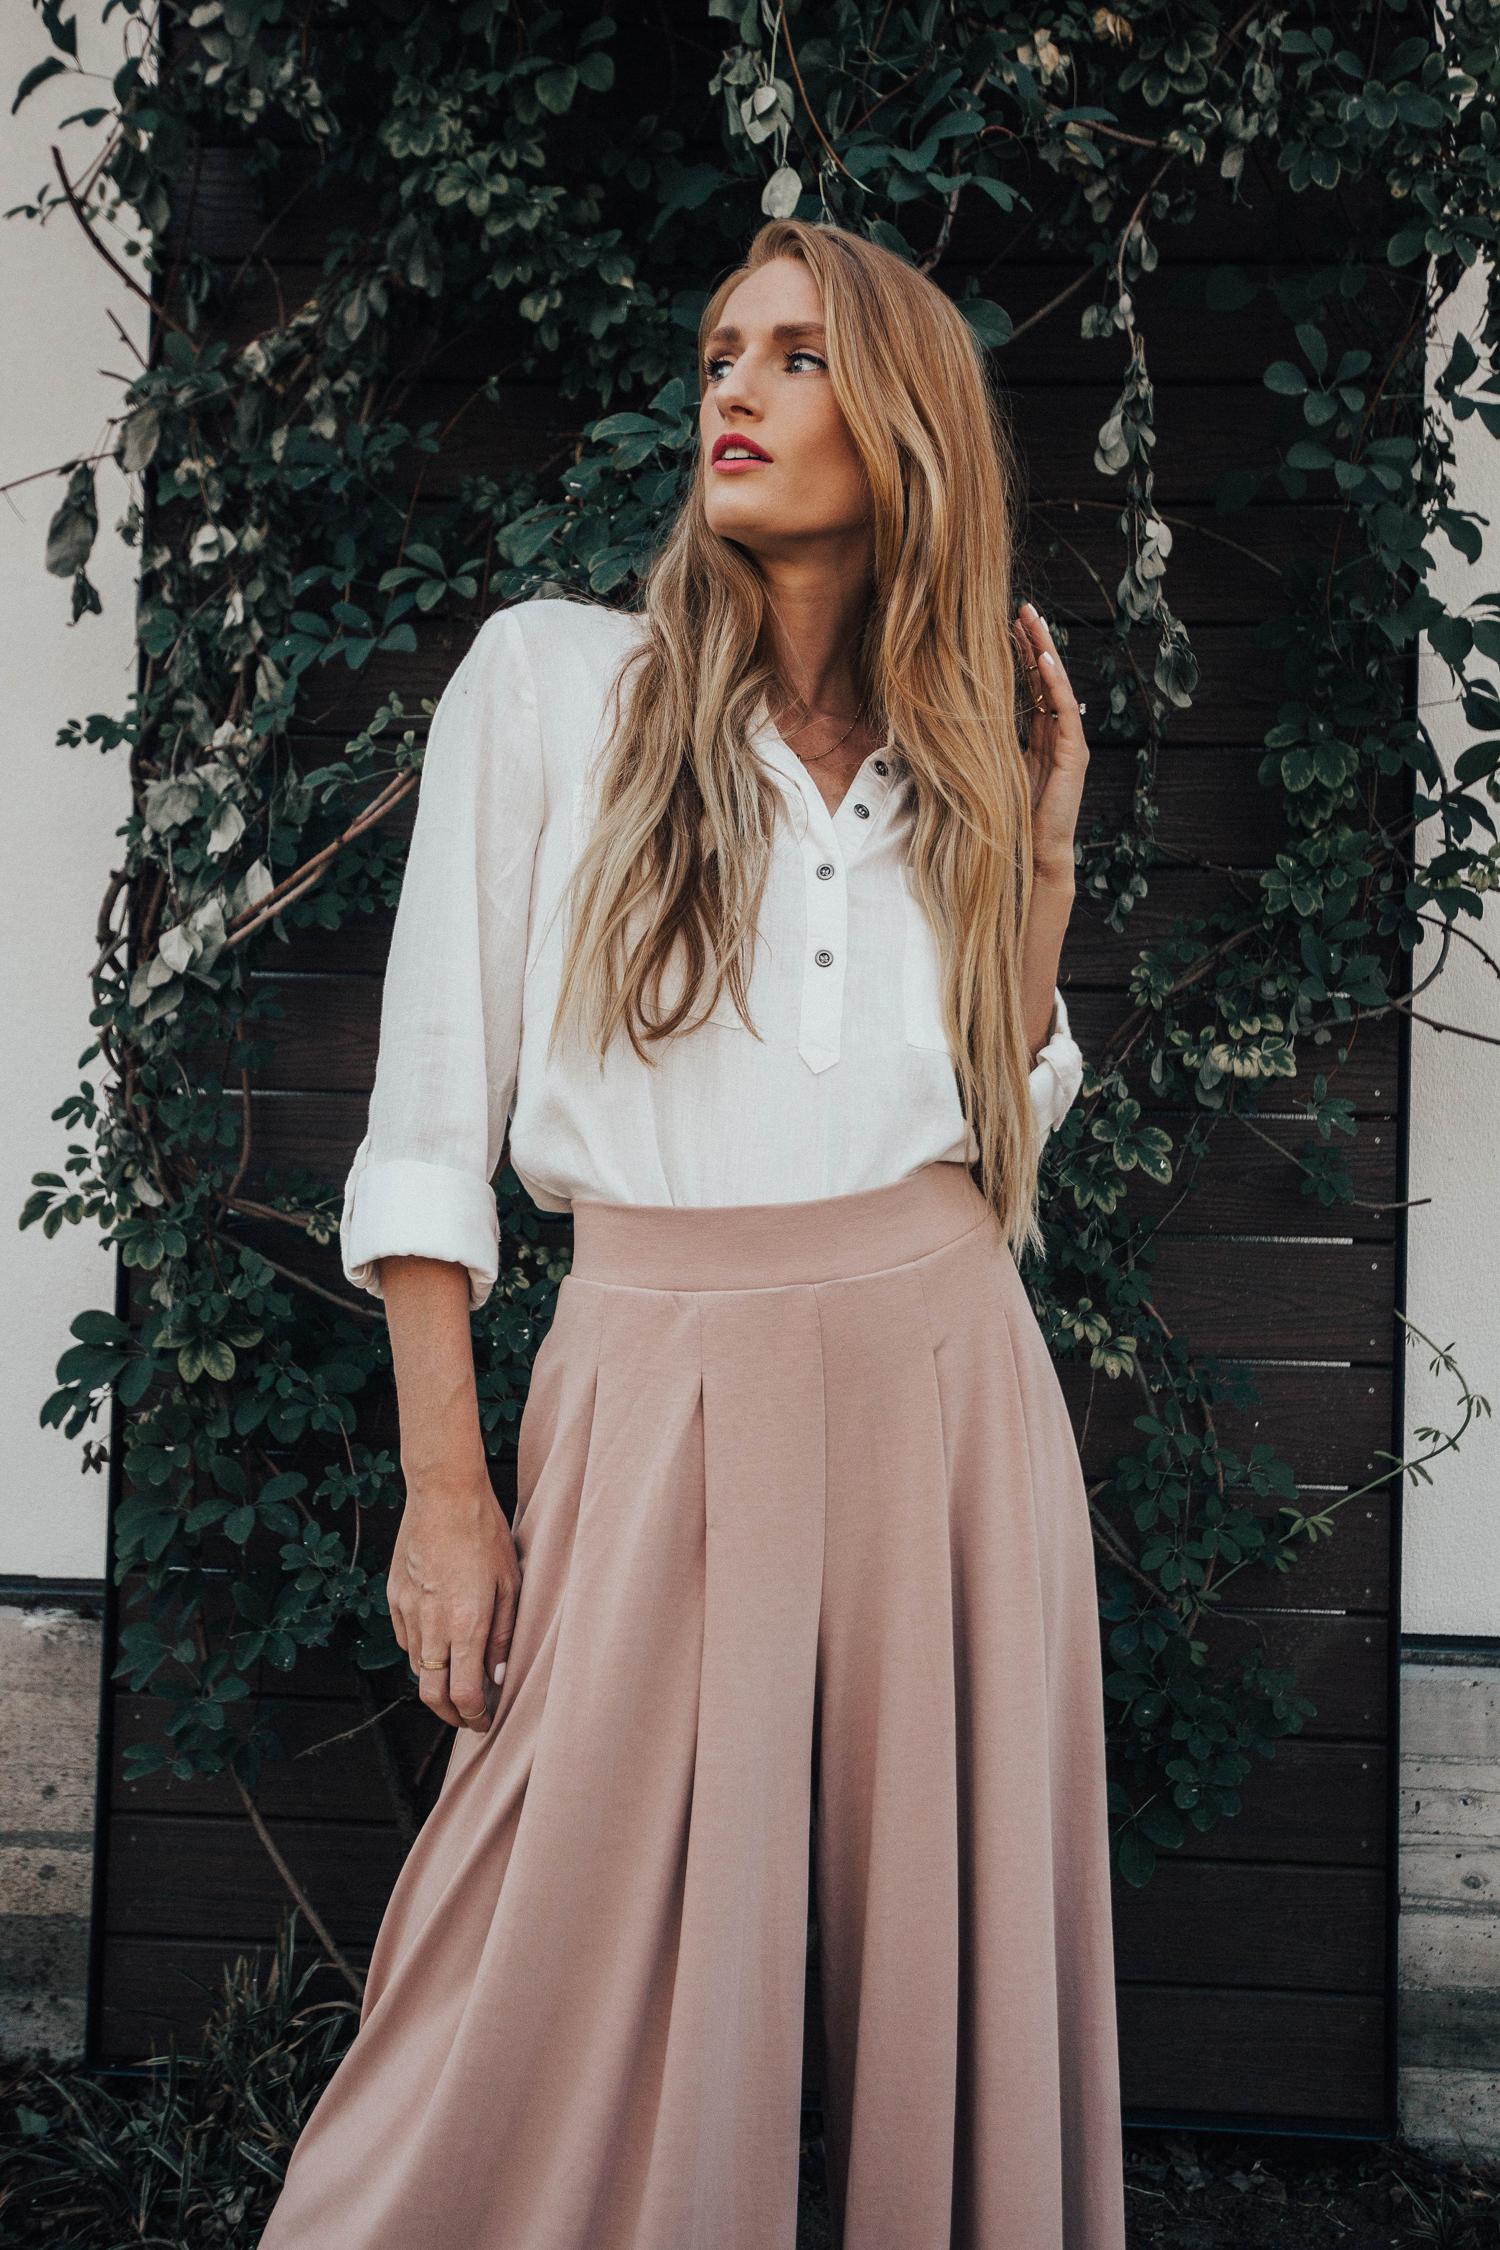 NARS Lipstick White Blouse Pink Pants